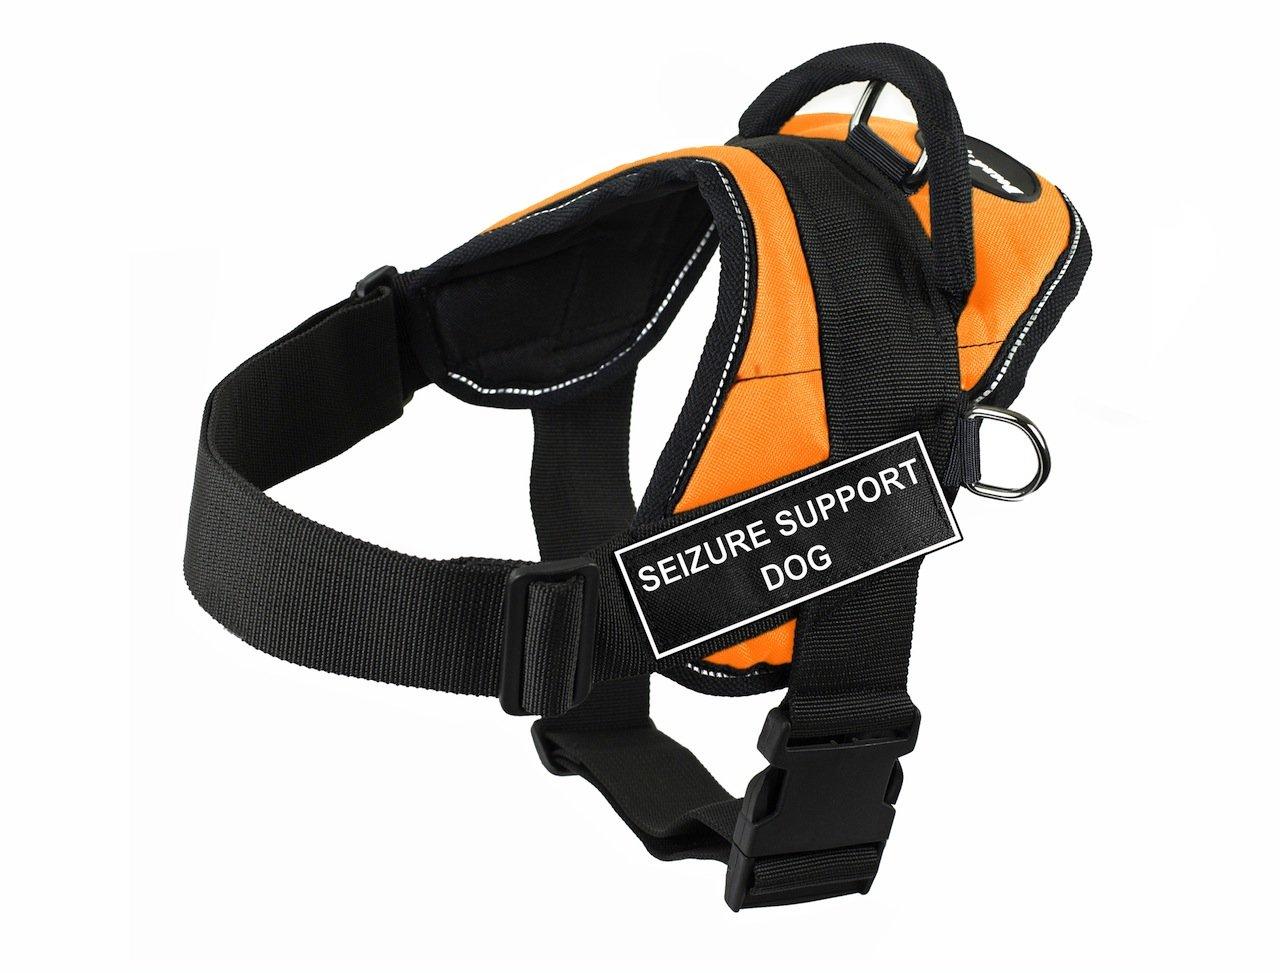 Dean & Tyler DT Fun Seizure Support Dog  Harness with Reflective Trim, X-Small, orange